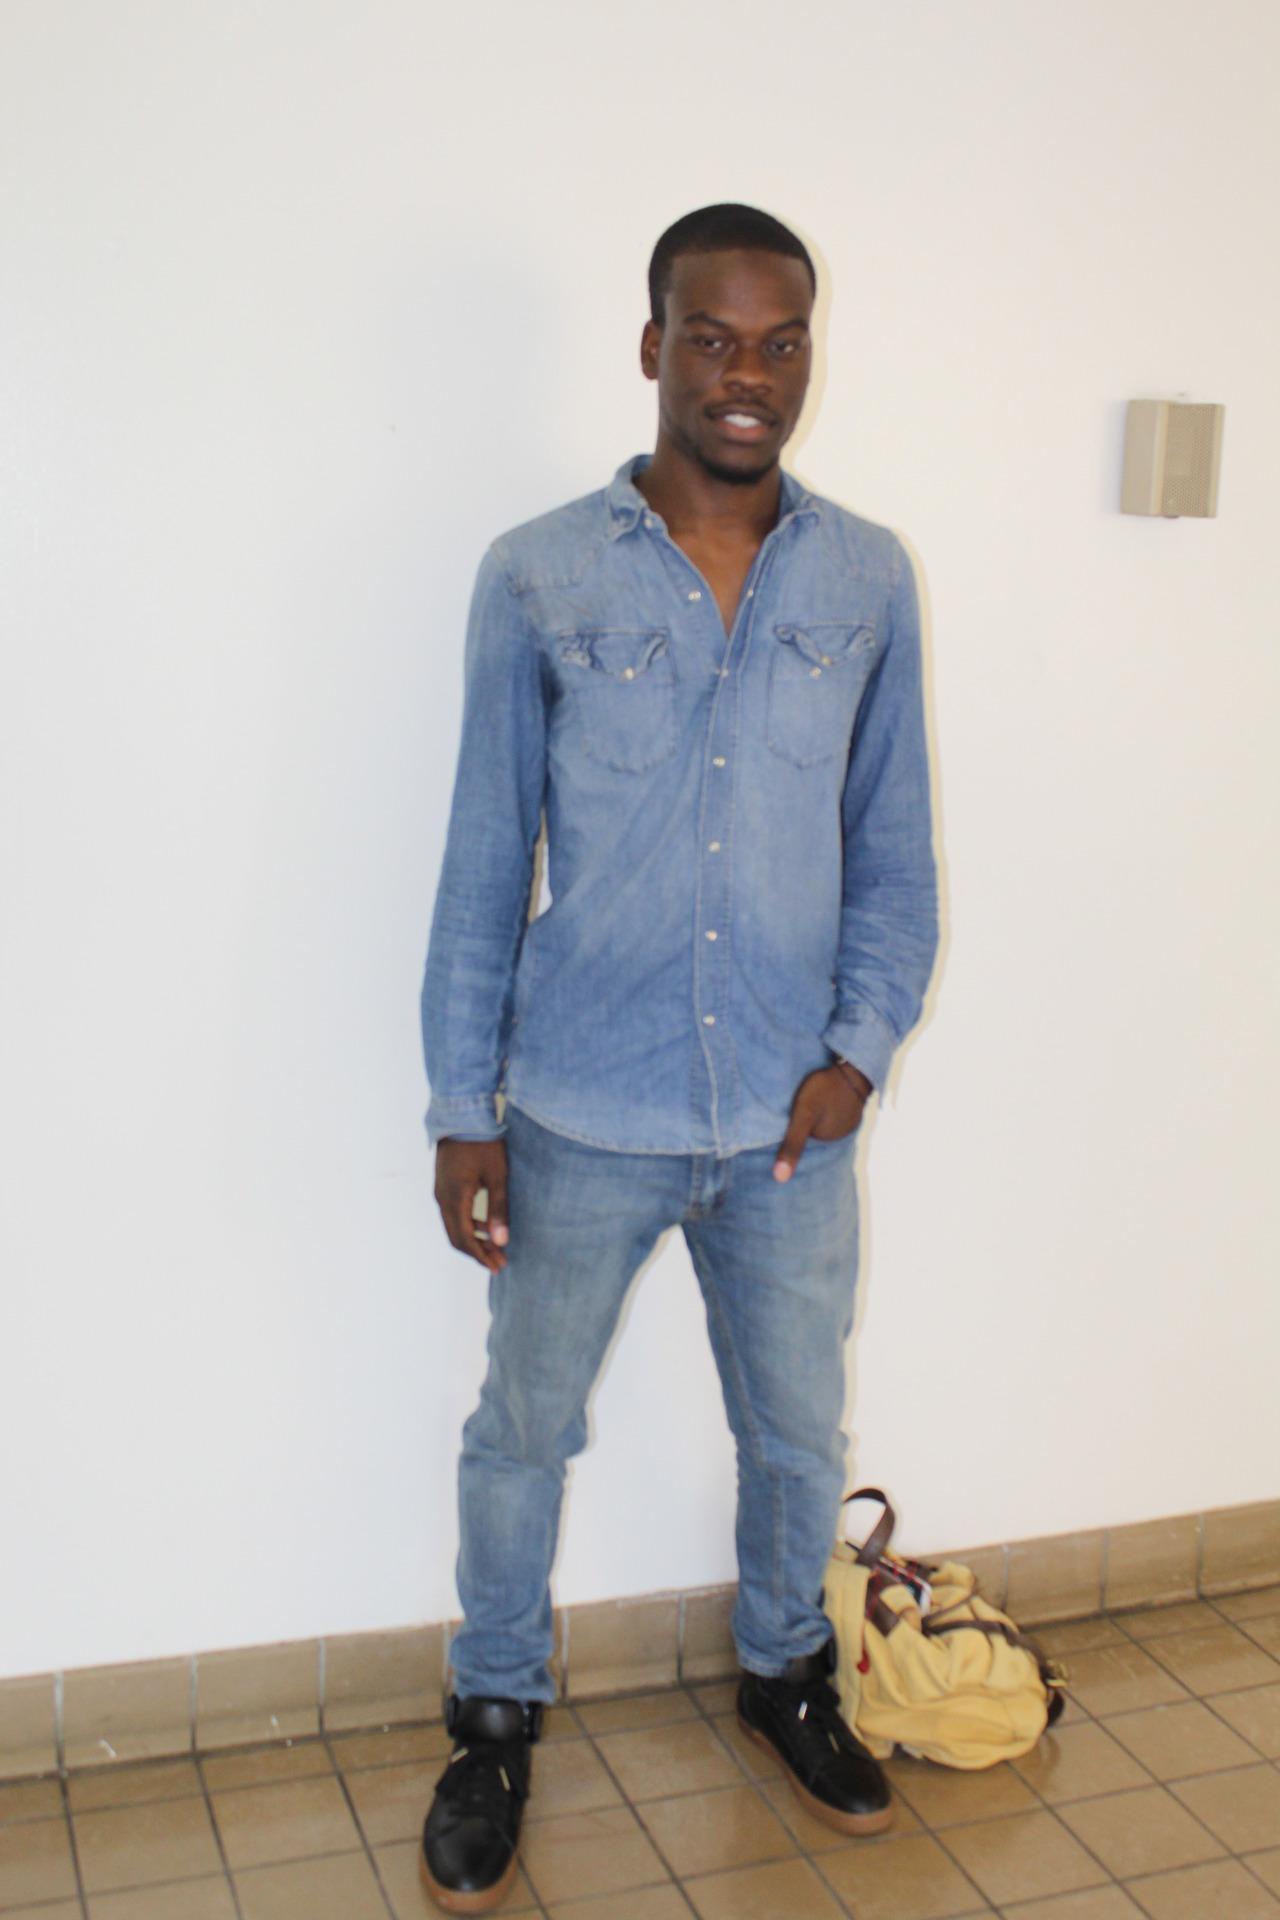 Alloysius Ndiyo, junior, Civil Engineering major